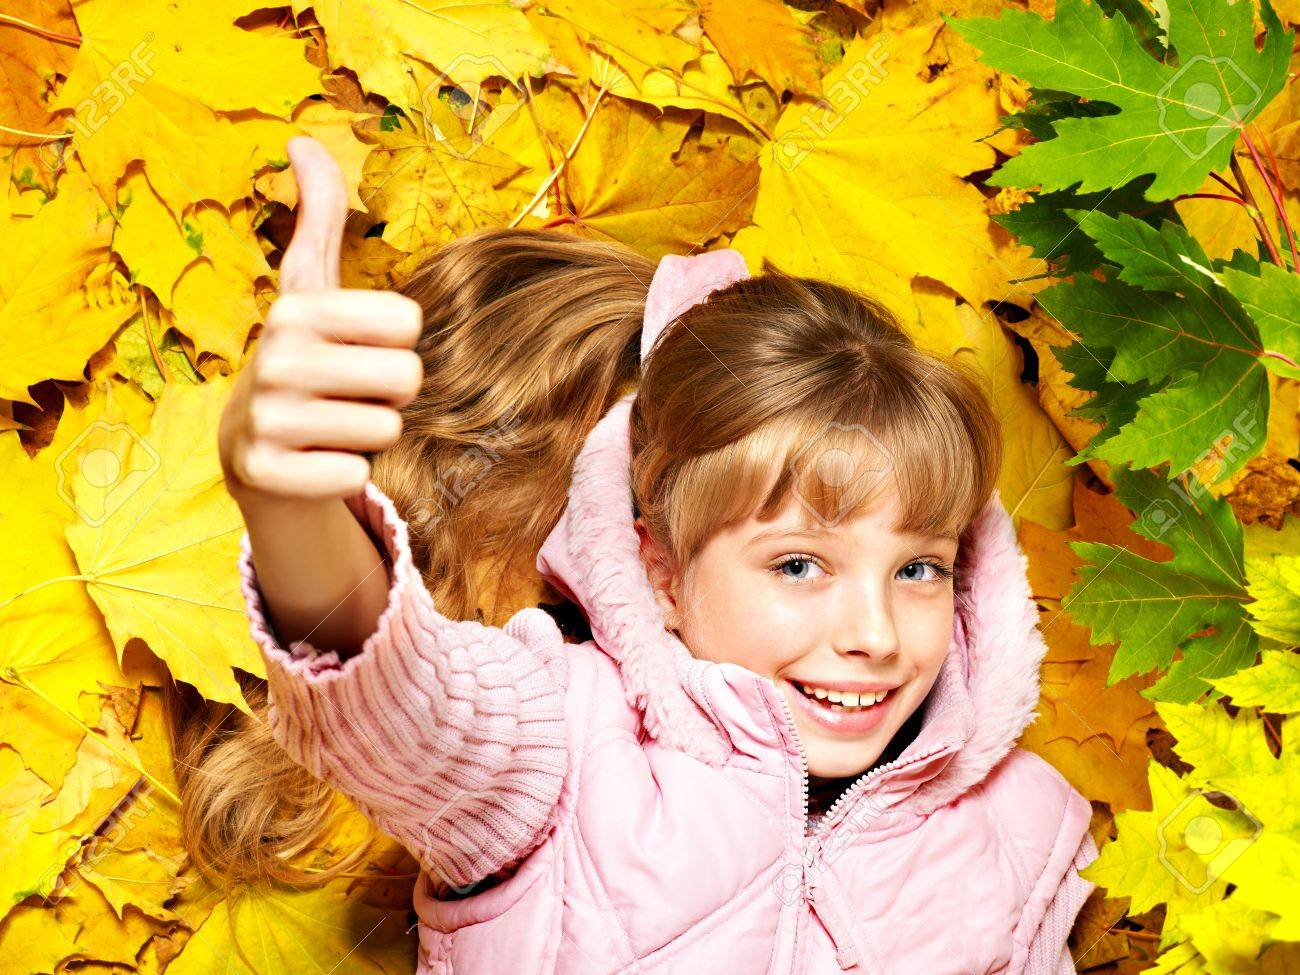 Child in autumn orange leaves. Outdoor. Stock Photo - 10701656